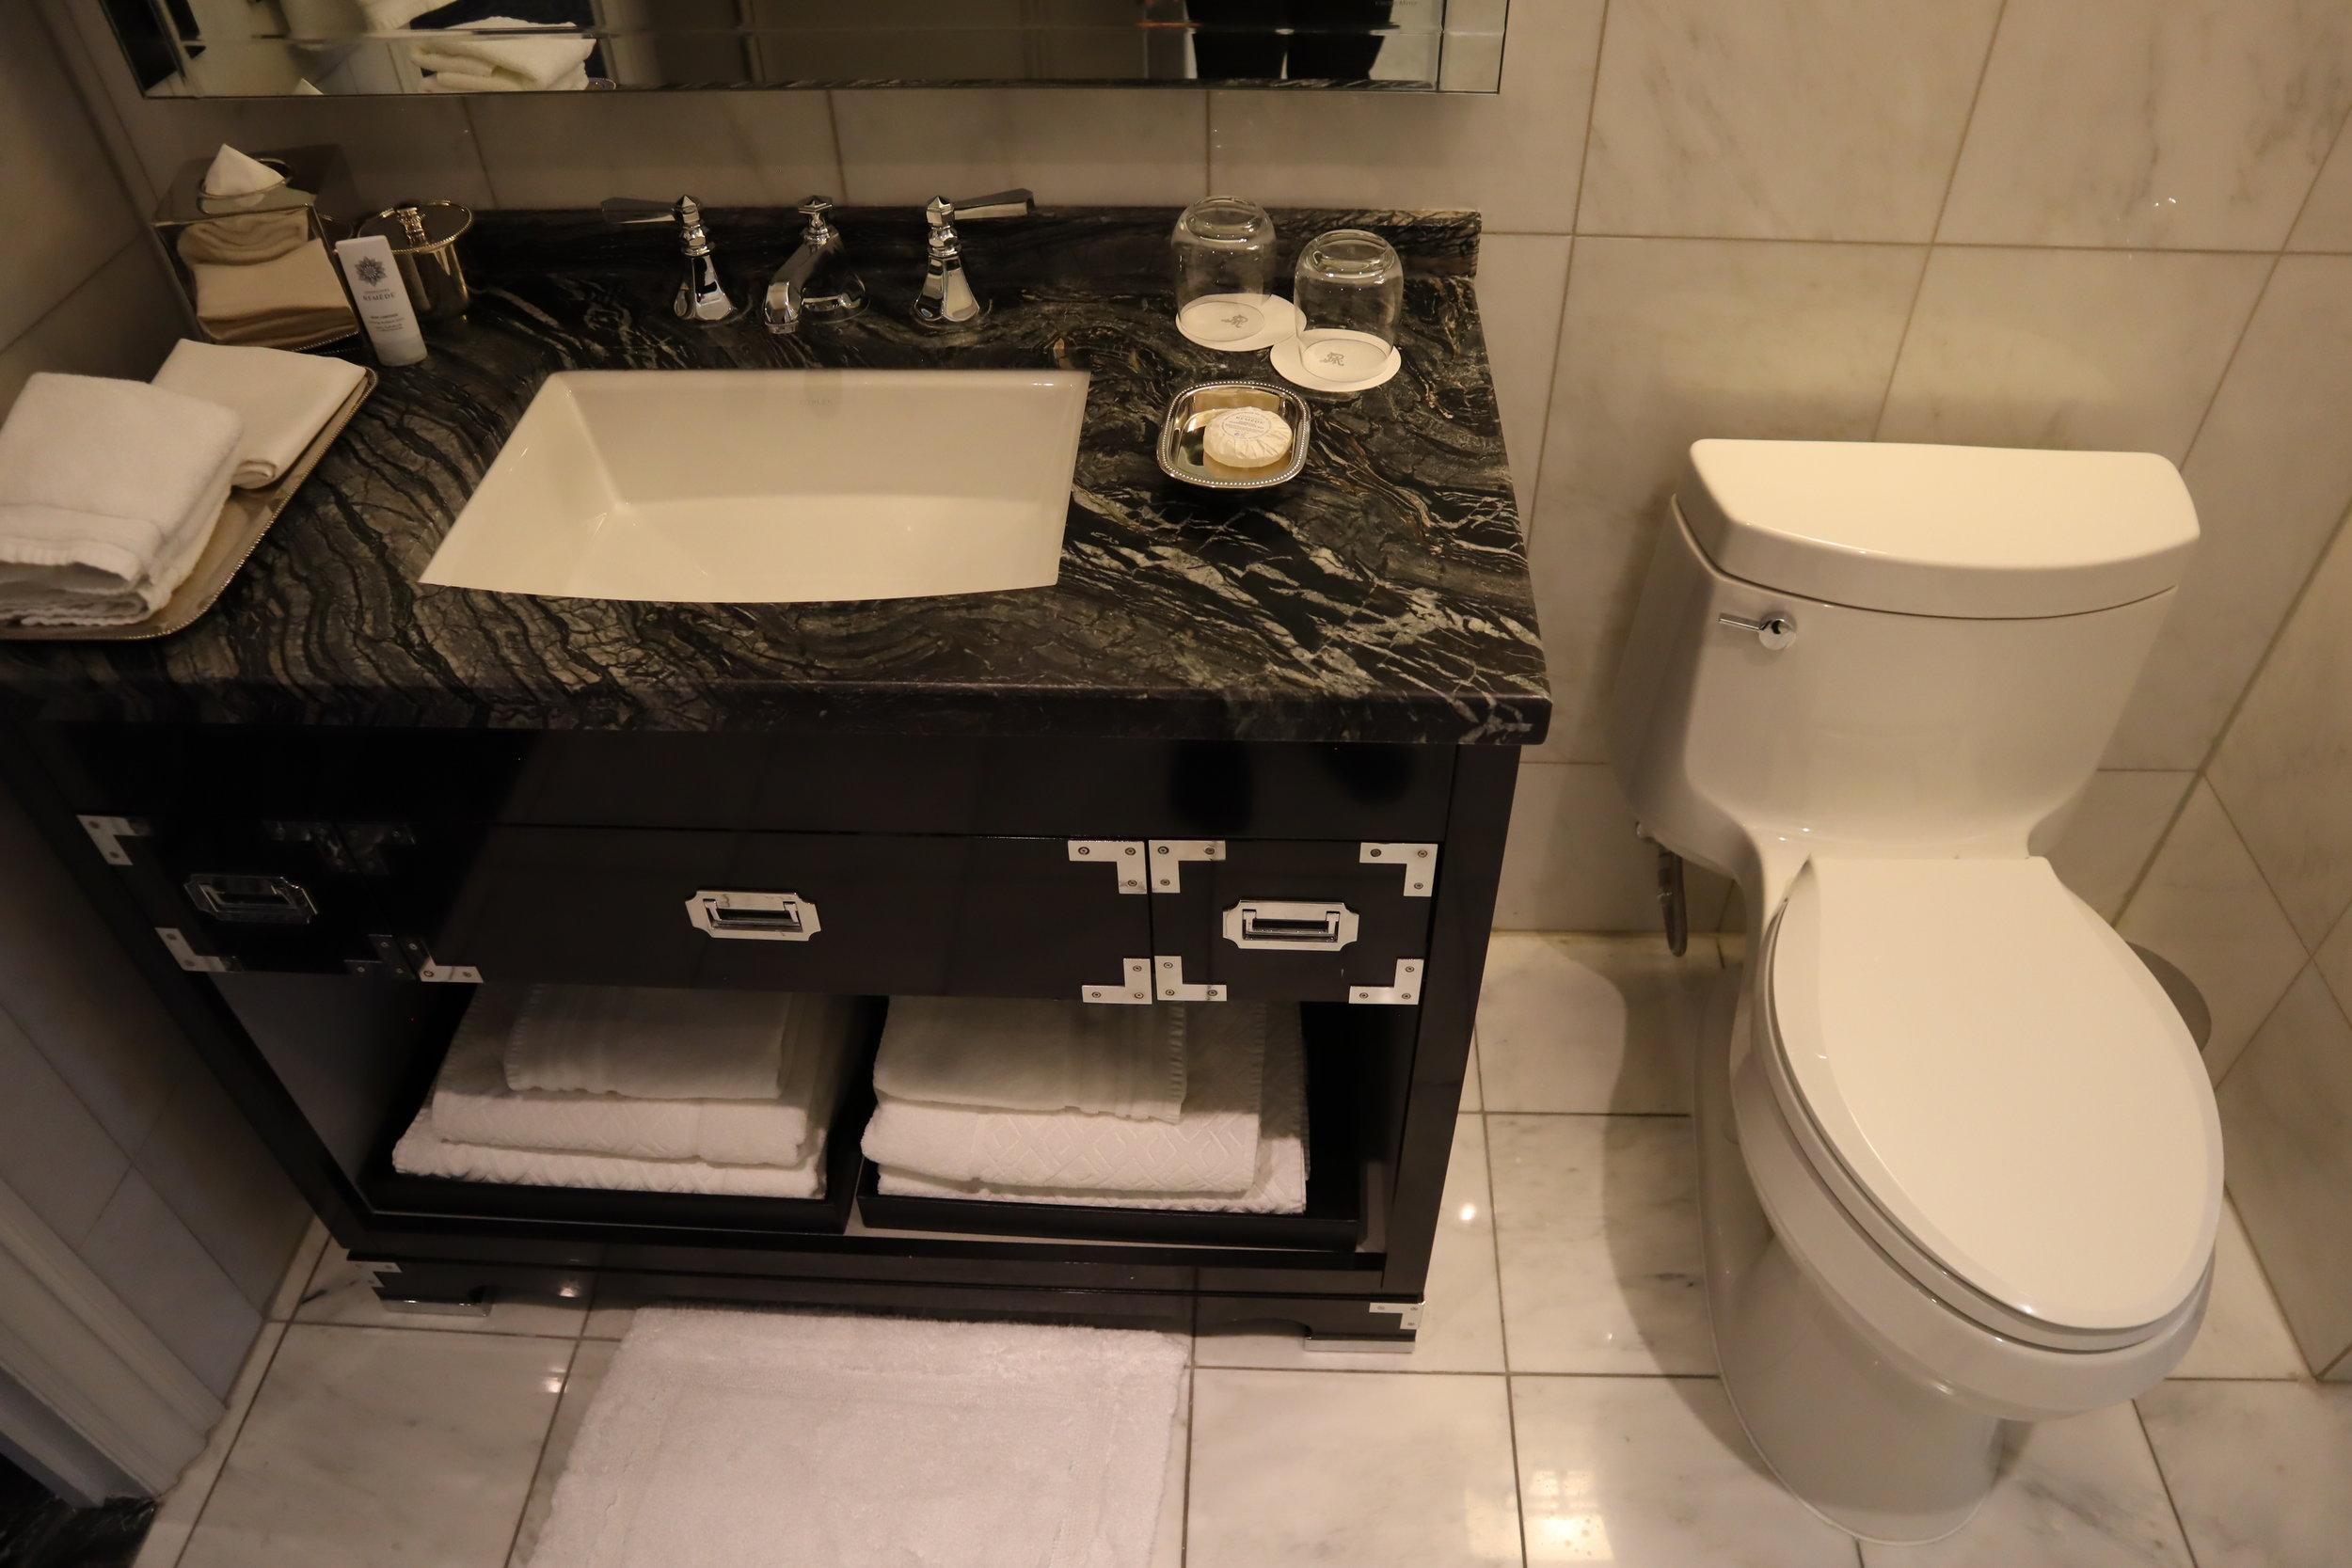 St. Regis Toronto – Two-bedroom suite guest bathroom sink & toilet